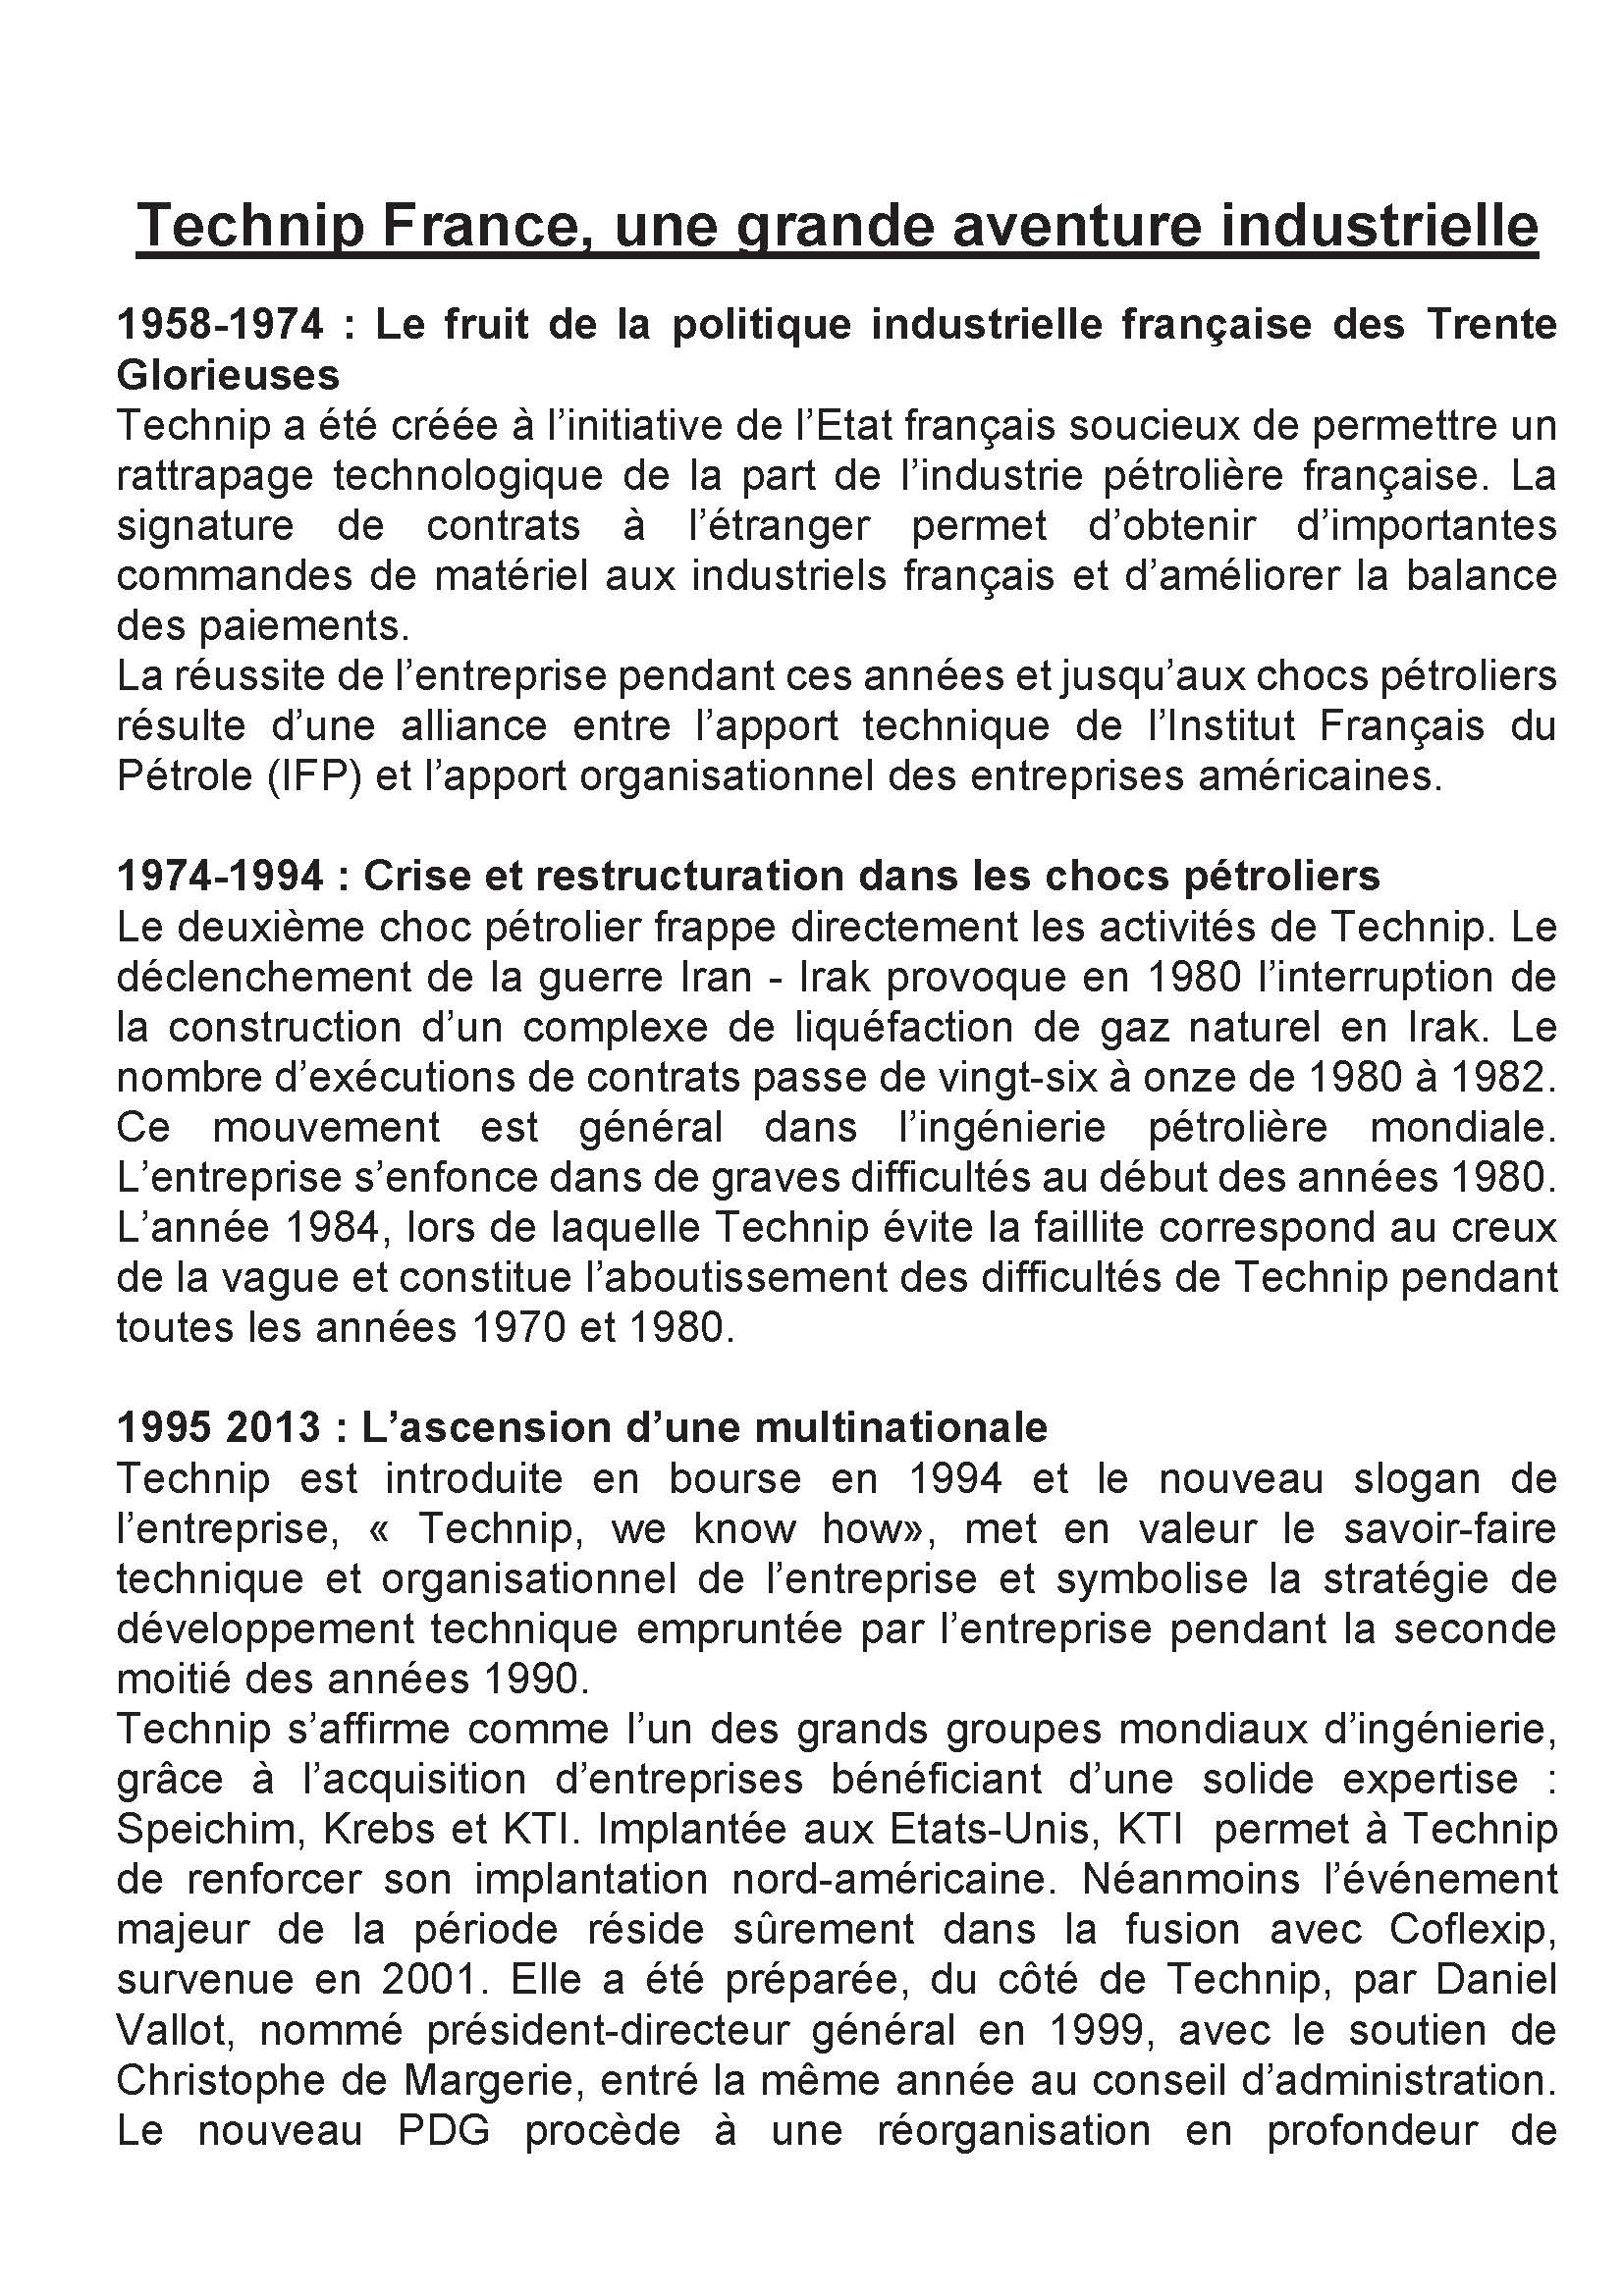 (2018-05-25) - TECHNIP FRANCE A 60 ANS ! BON ANNIVERSAIRE Tract_42